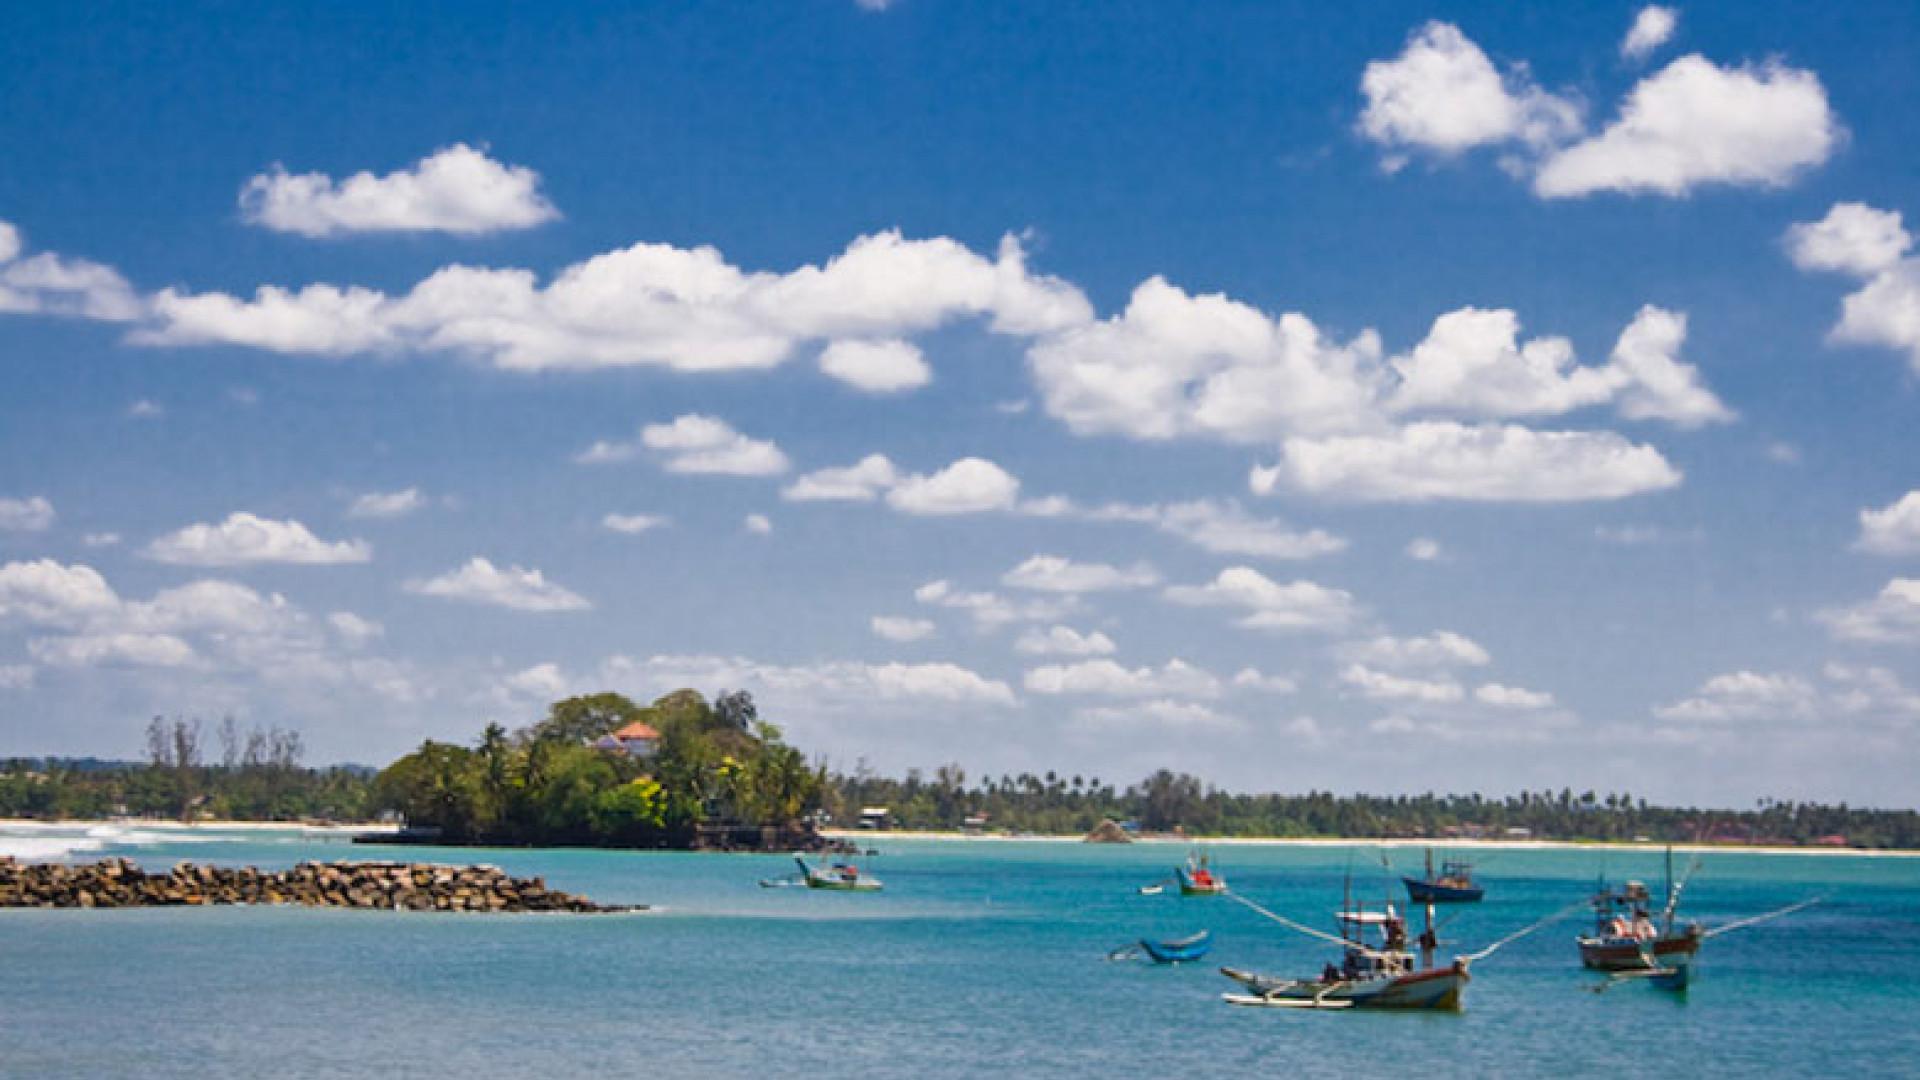 Courtesy-of-Ghetan-Kumara---Taprobane-Island